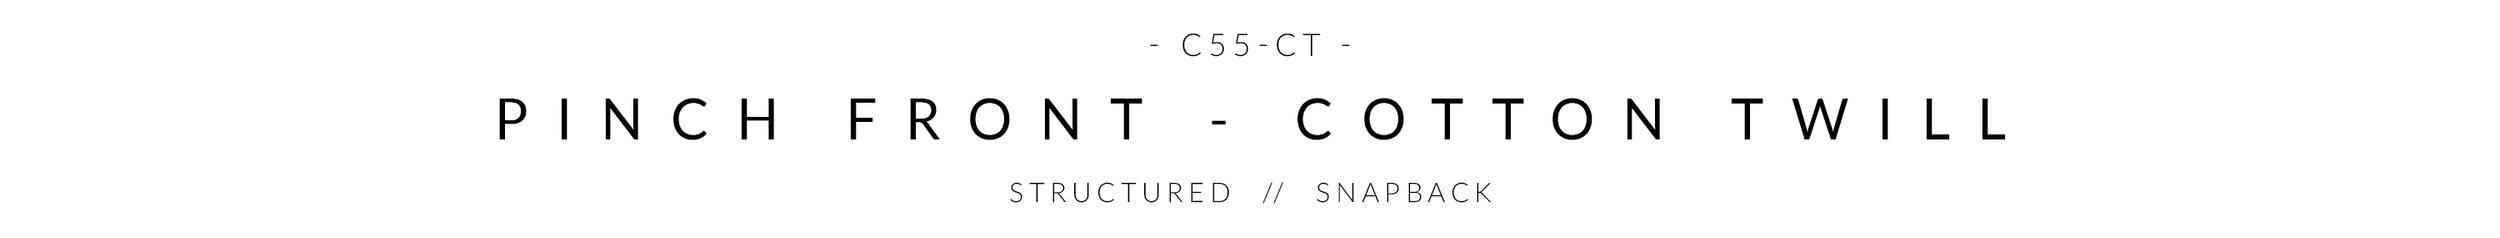 C55 - CT - HEADER.jpg